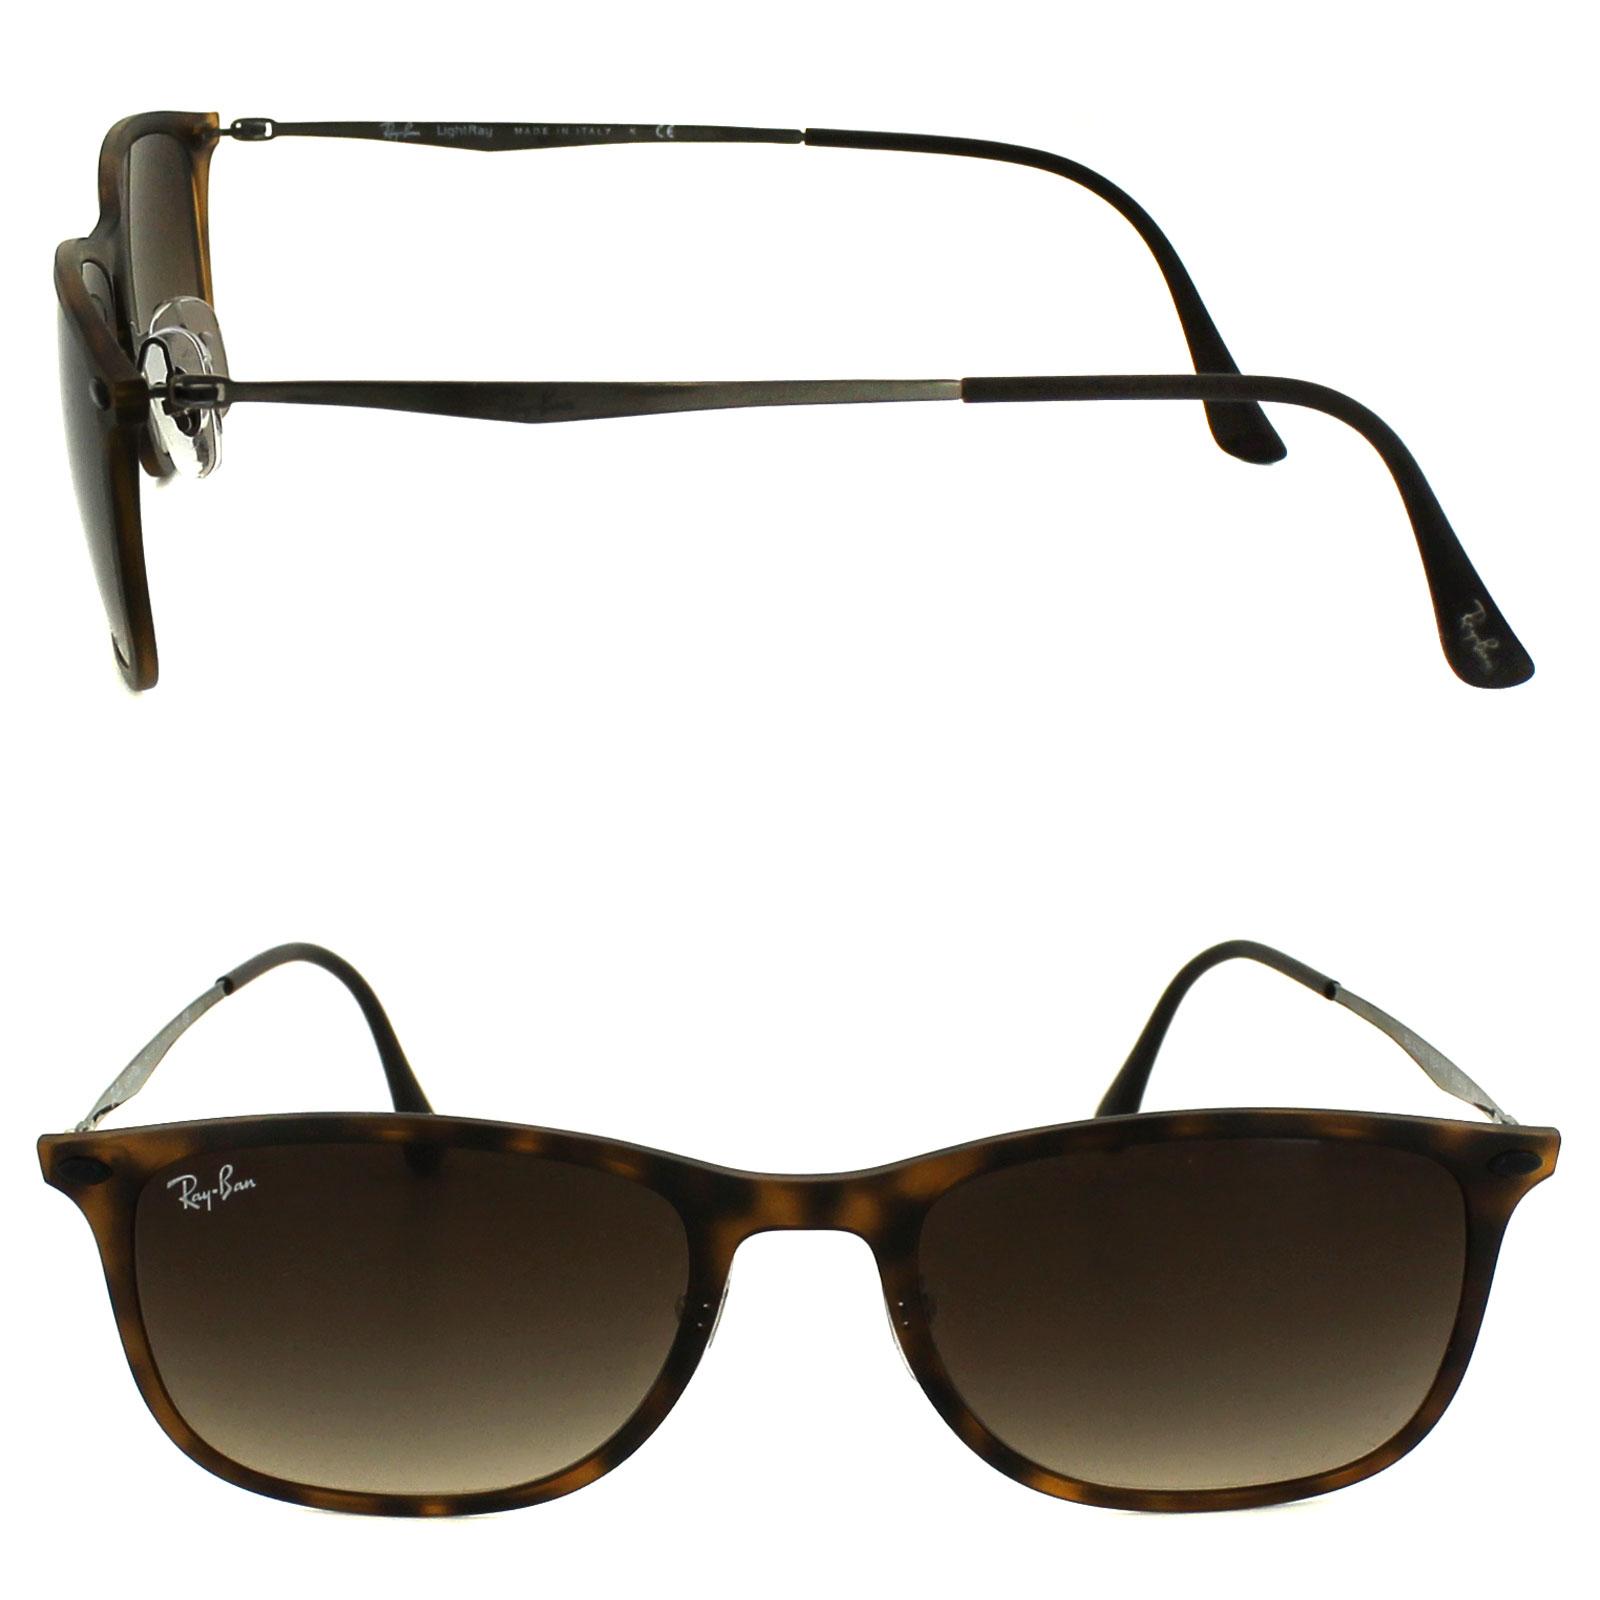 db529c5cb5df7 Sentinel Ray-Ban Sunglasses New Wayfarer Light Ray 4225 894 13 Tortoise  Brown Gradient